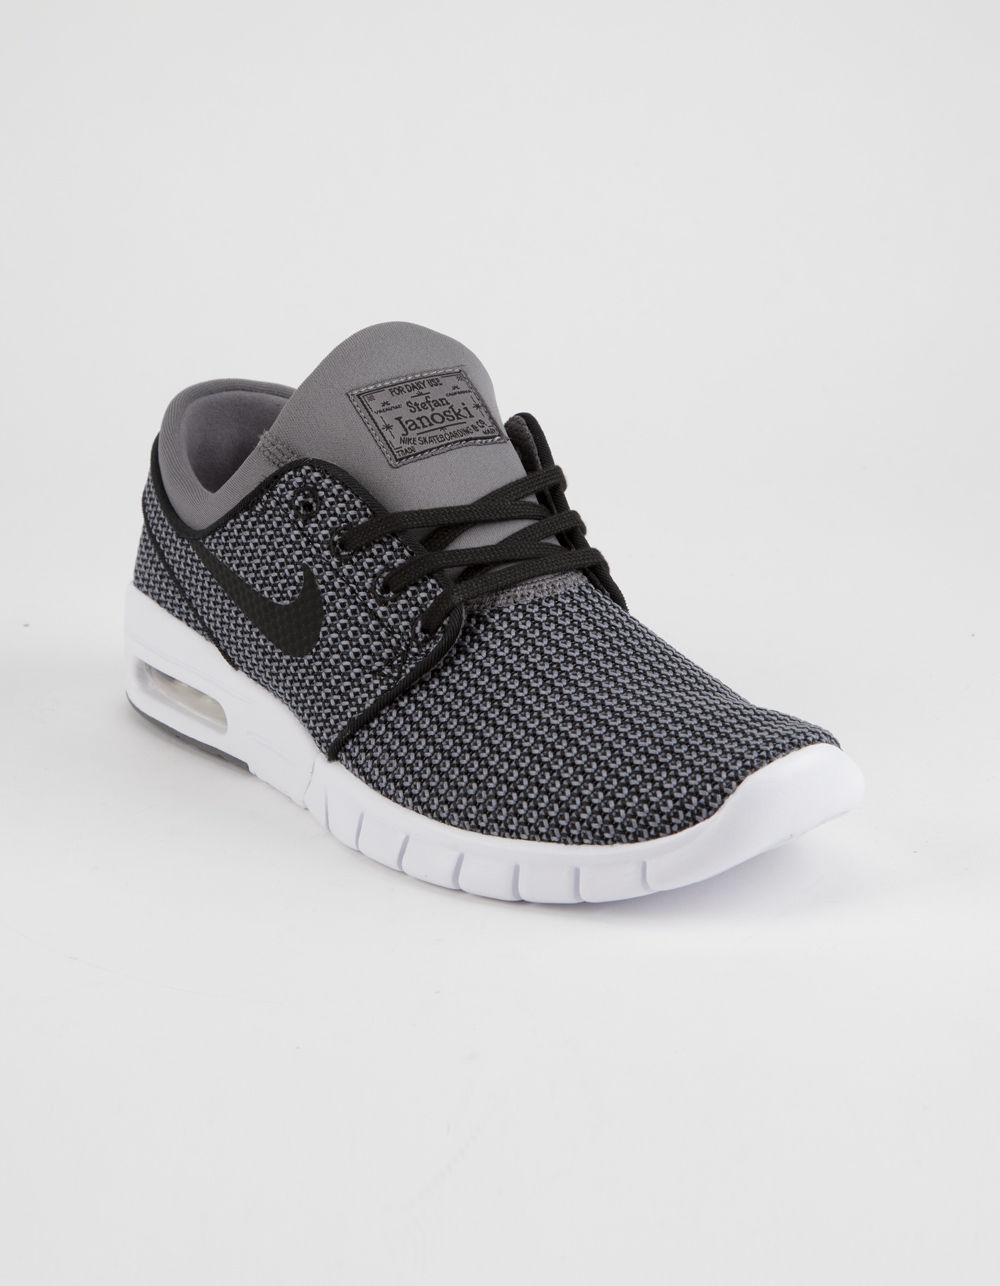 4ee270dc6f3f3 Lyst - Nike Stefan Janoski Max Gunsmoke White   Black Shoes in Gray for Men